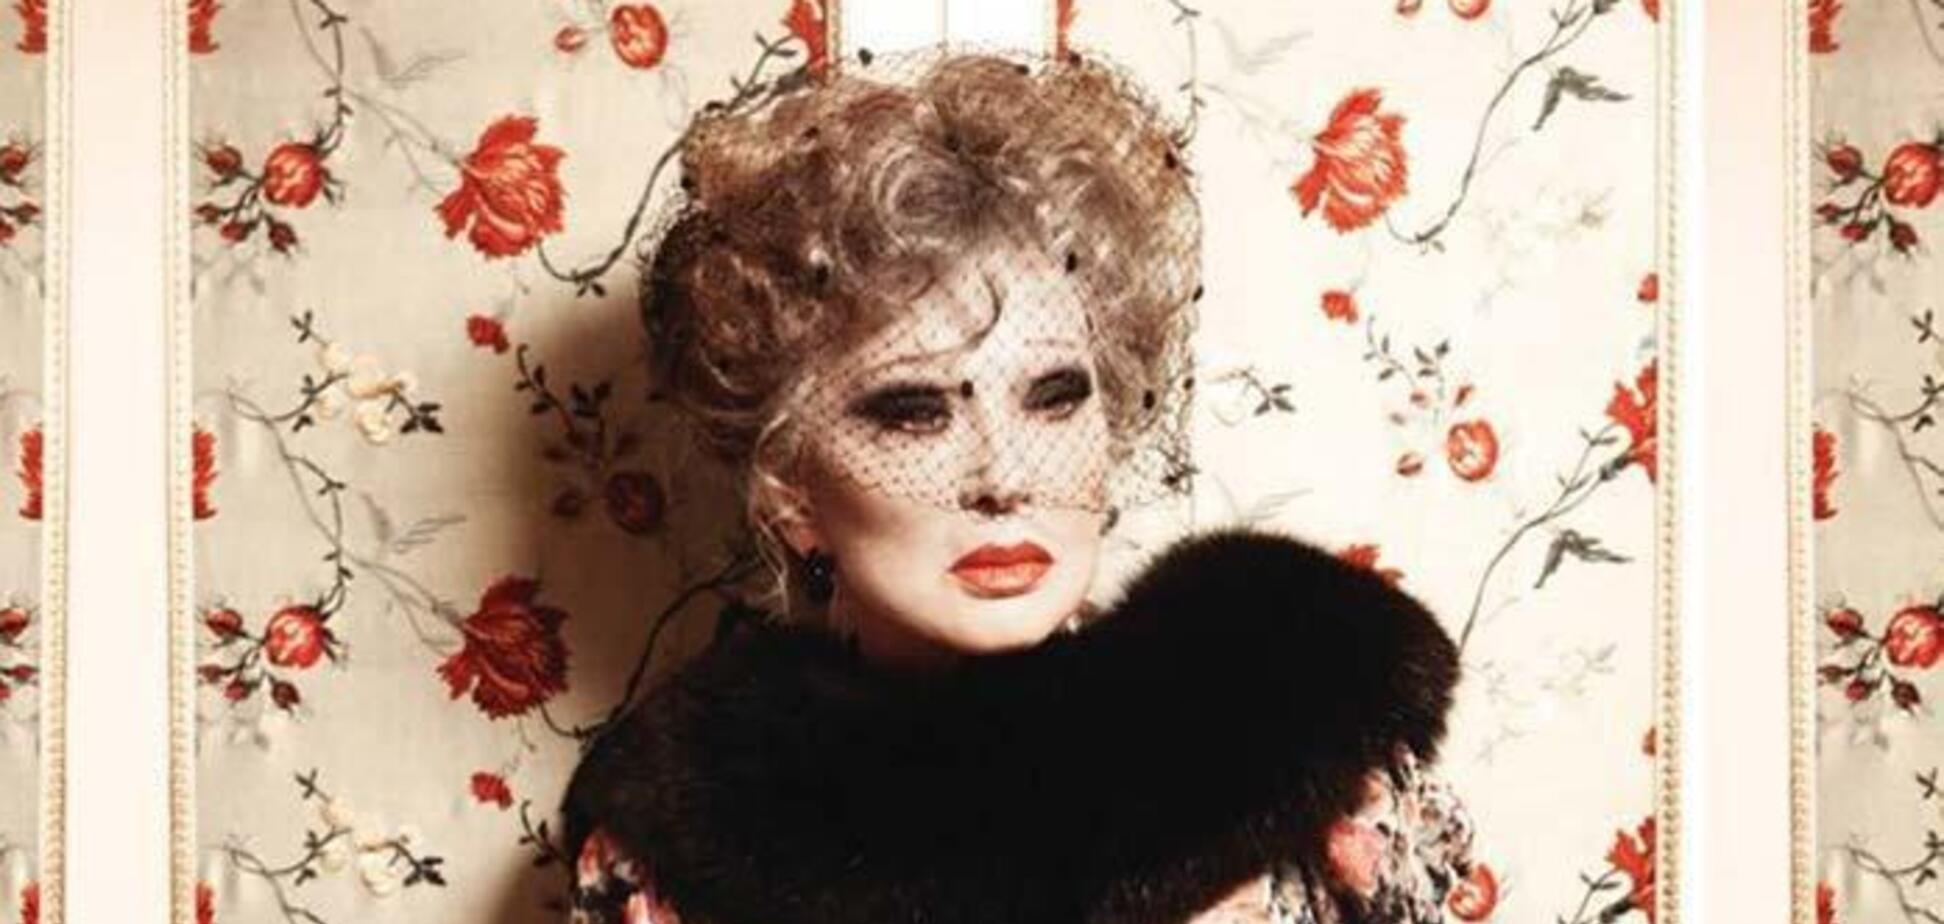 Гурченко умерла 9 лет назад: кого из мужчин любила легенда кино СССР